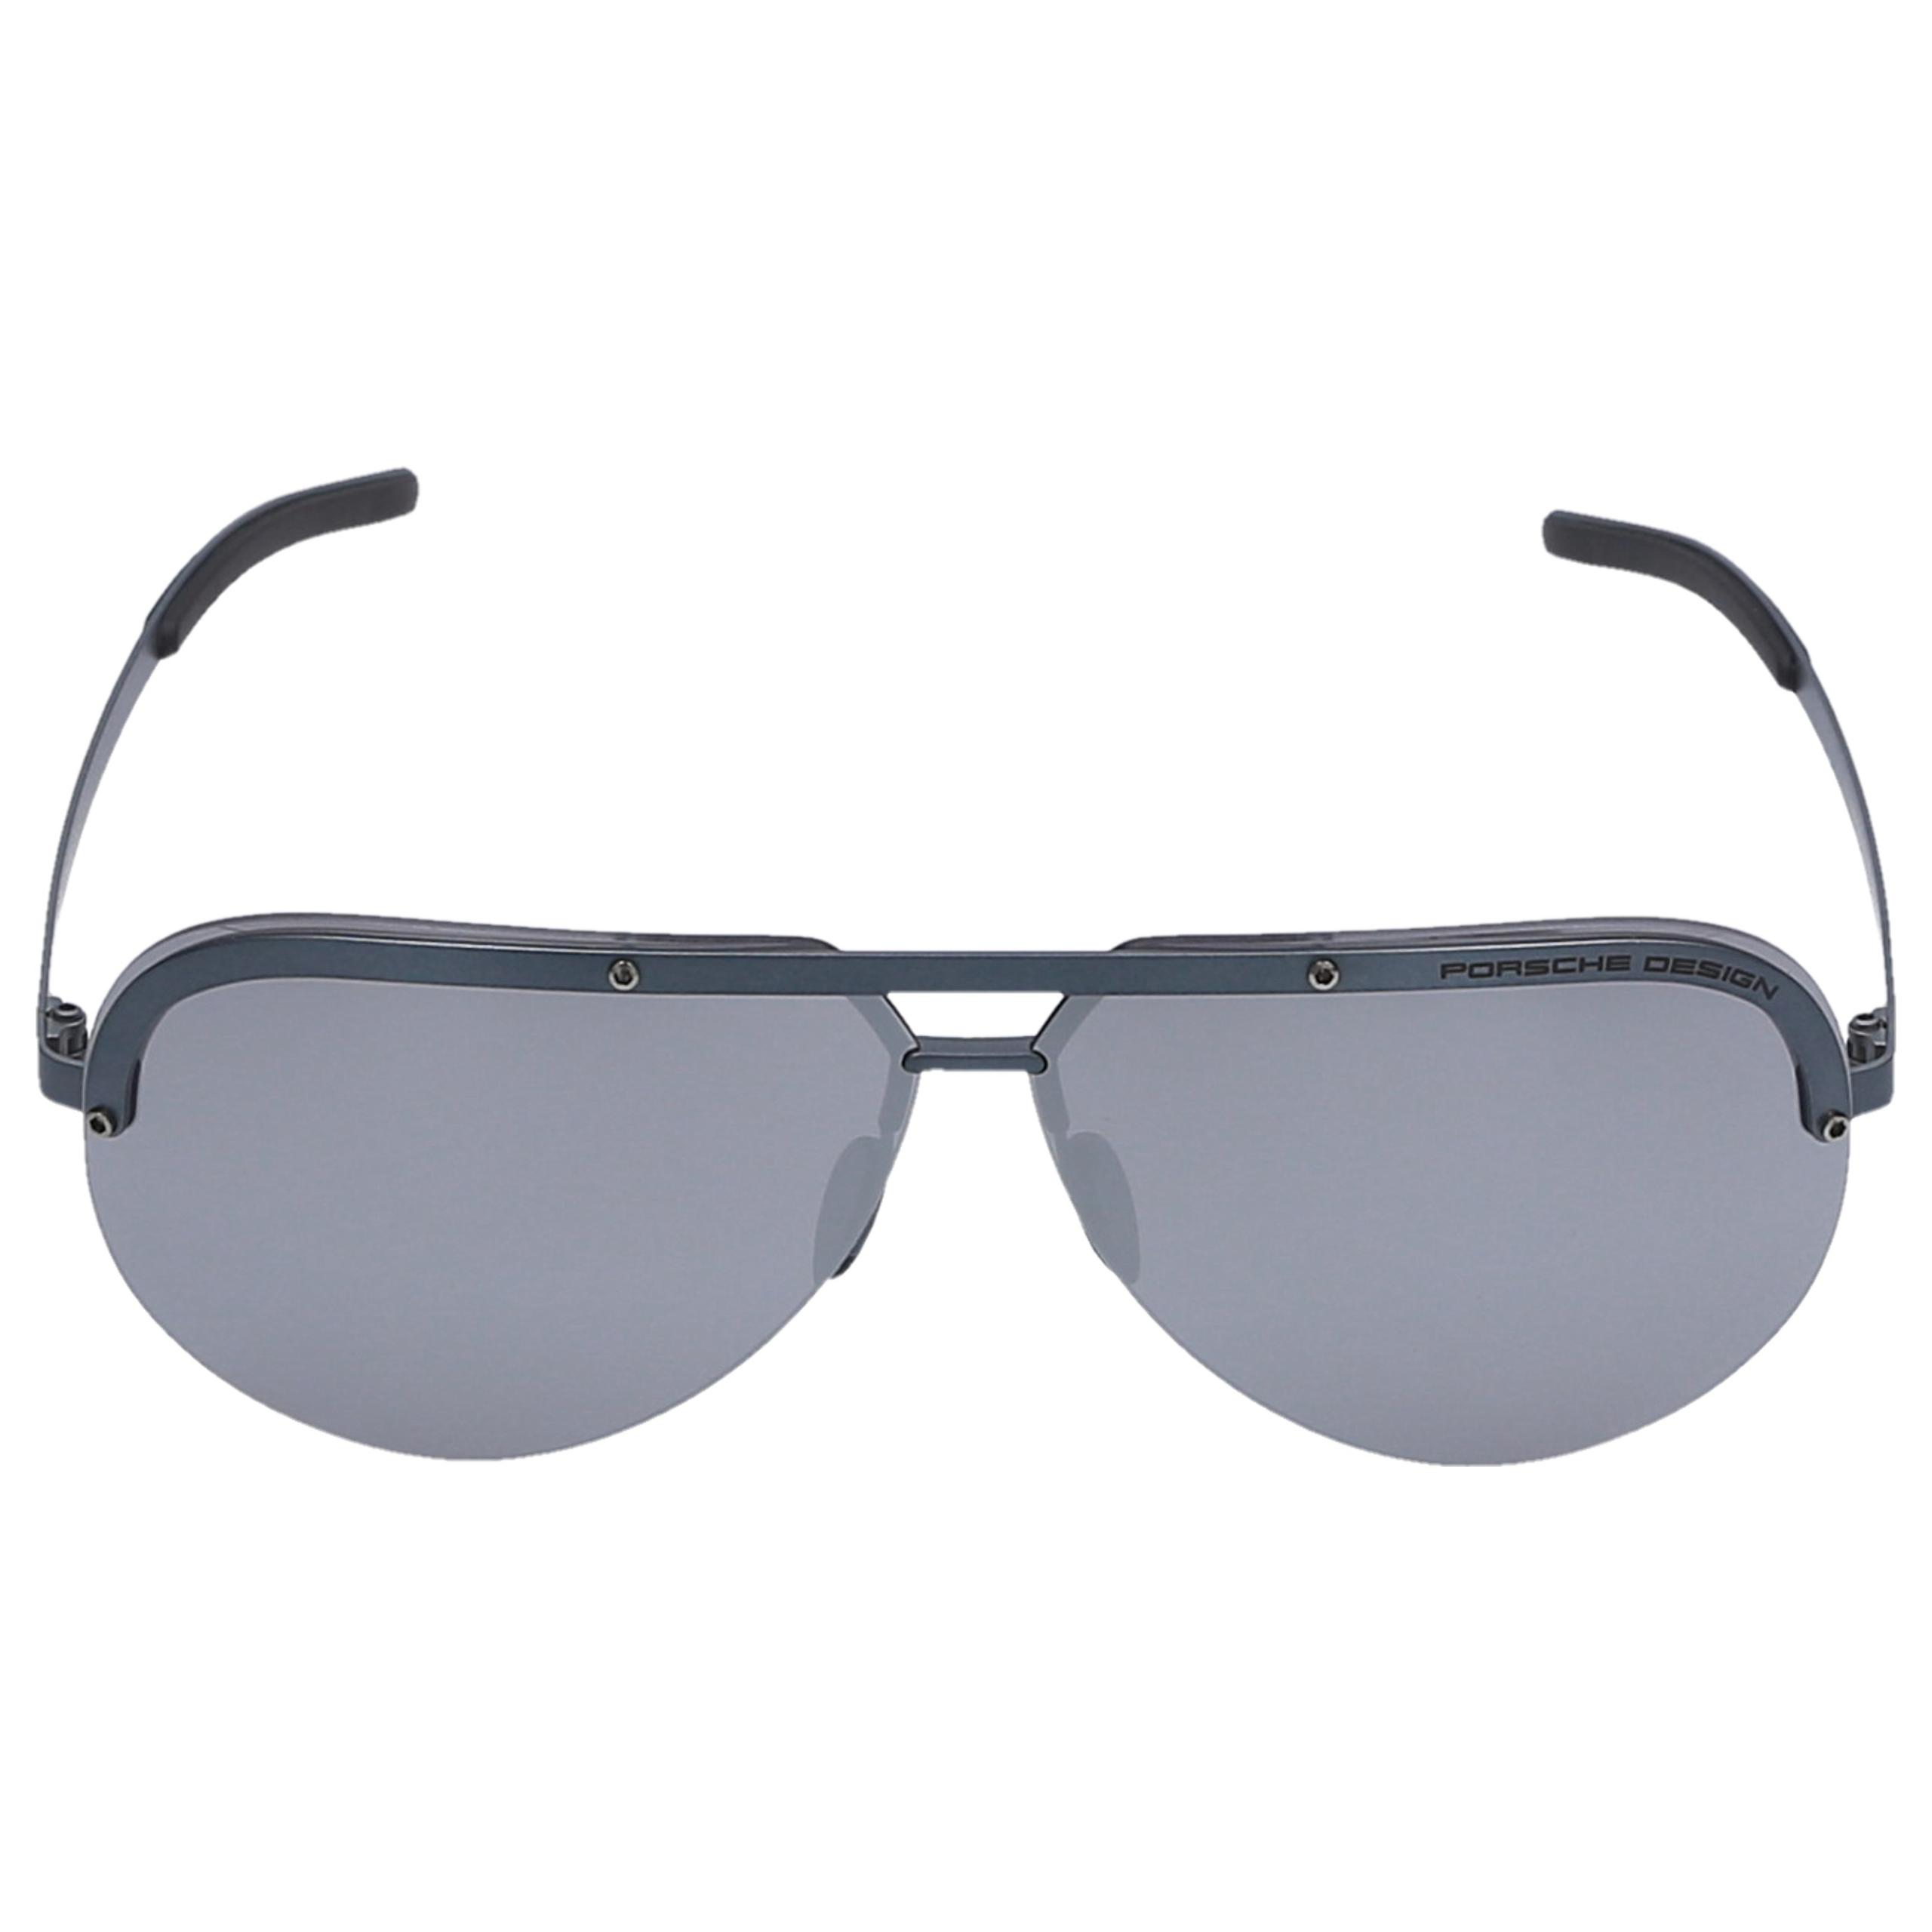 Sonnenbrille Aviator P8693 D 67/08 Metall grau